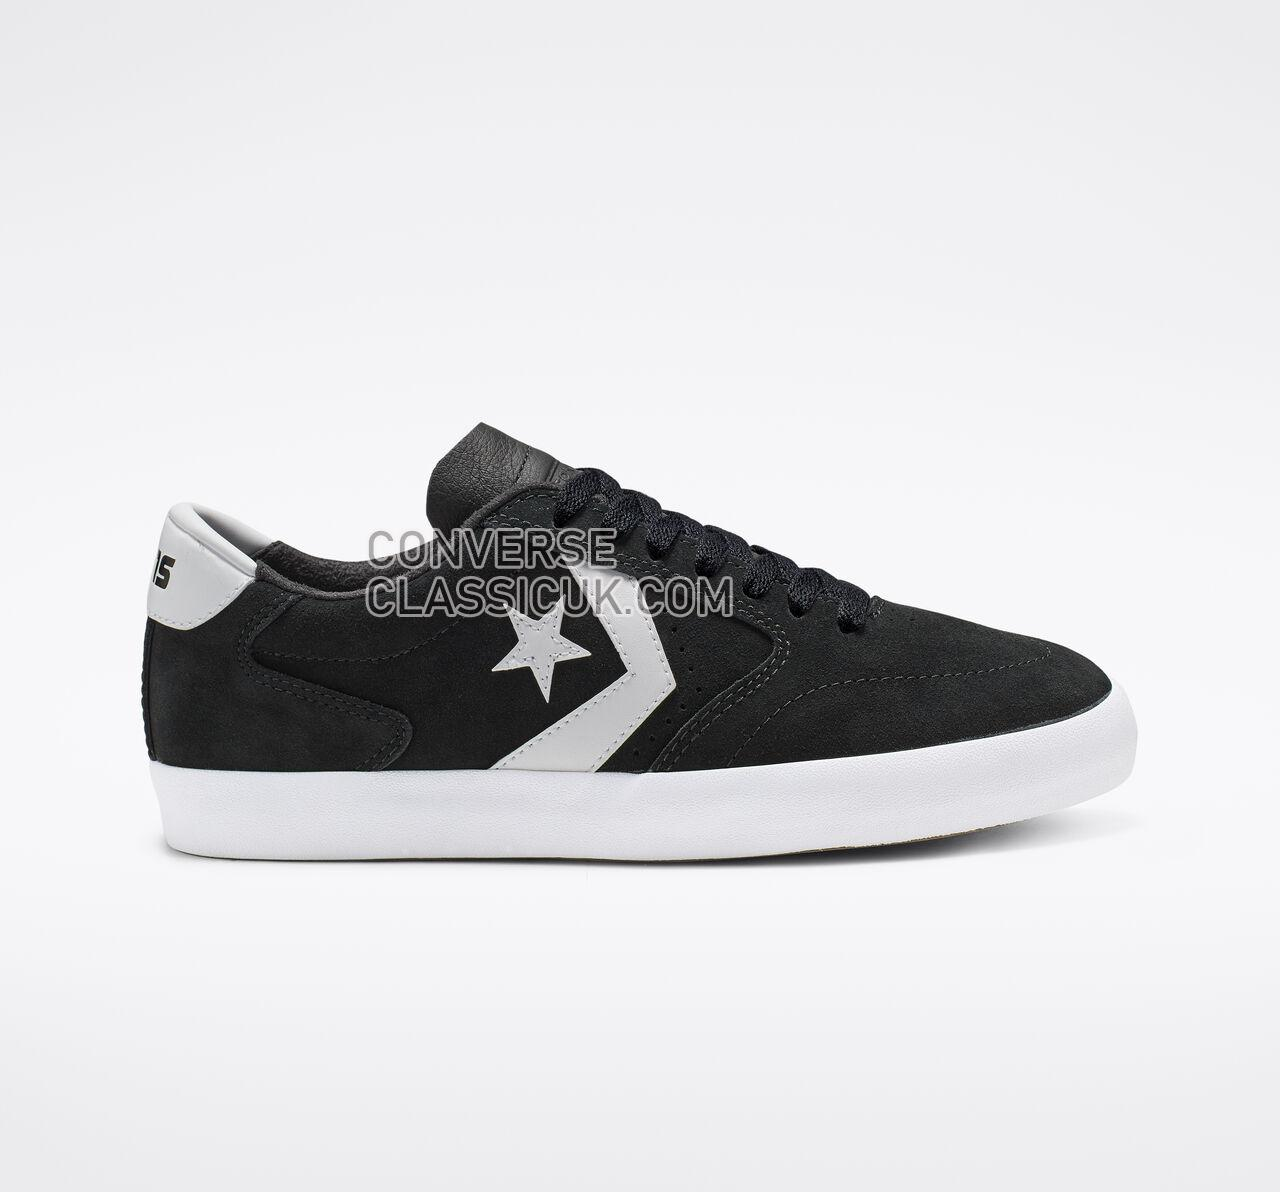 Converse Checkpoint Pro Low Top Mens Womens Unisex 165265C Black/White/White Shoes